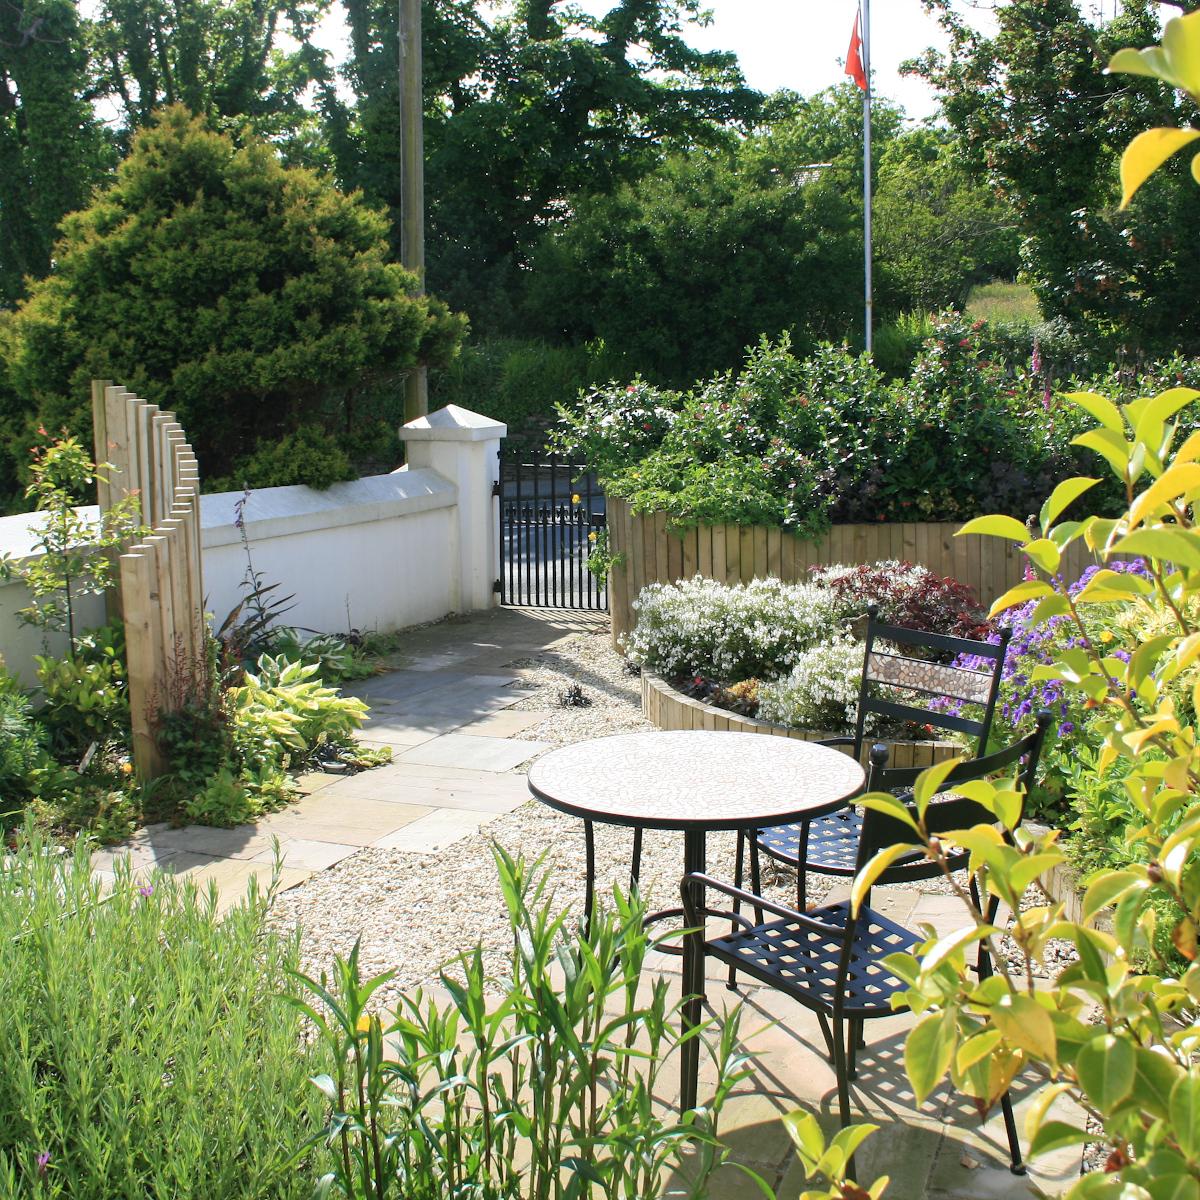 Summerhill Road garden design